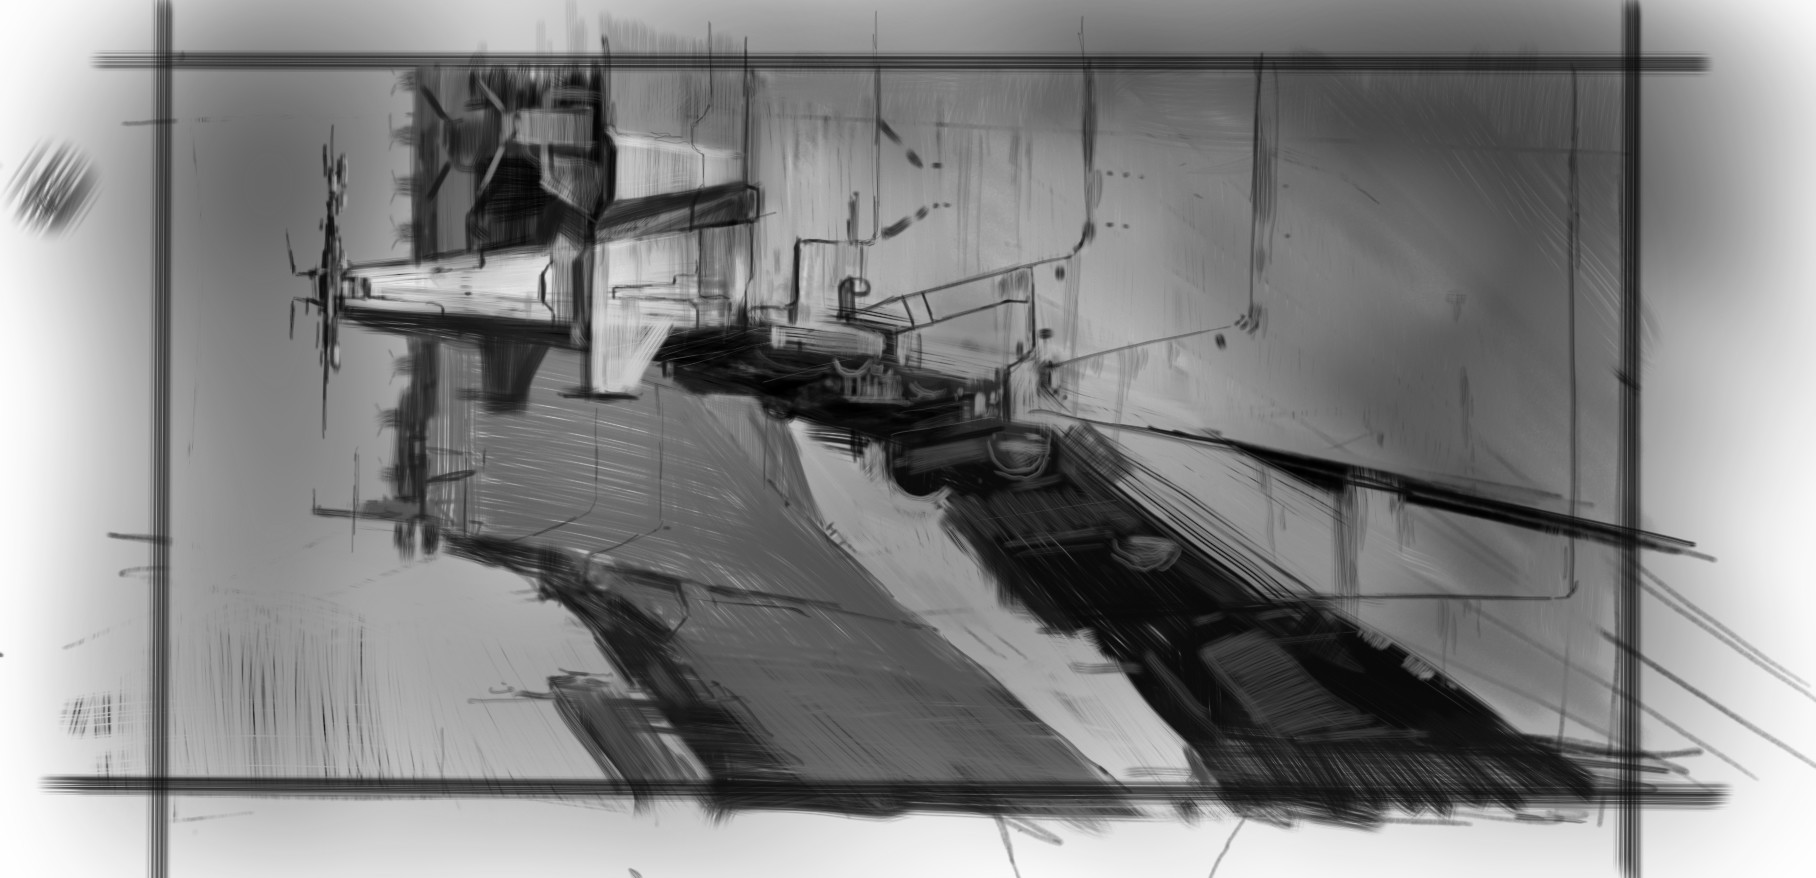 Martin deschambault project 77 korpa sketch